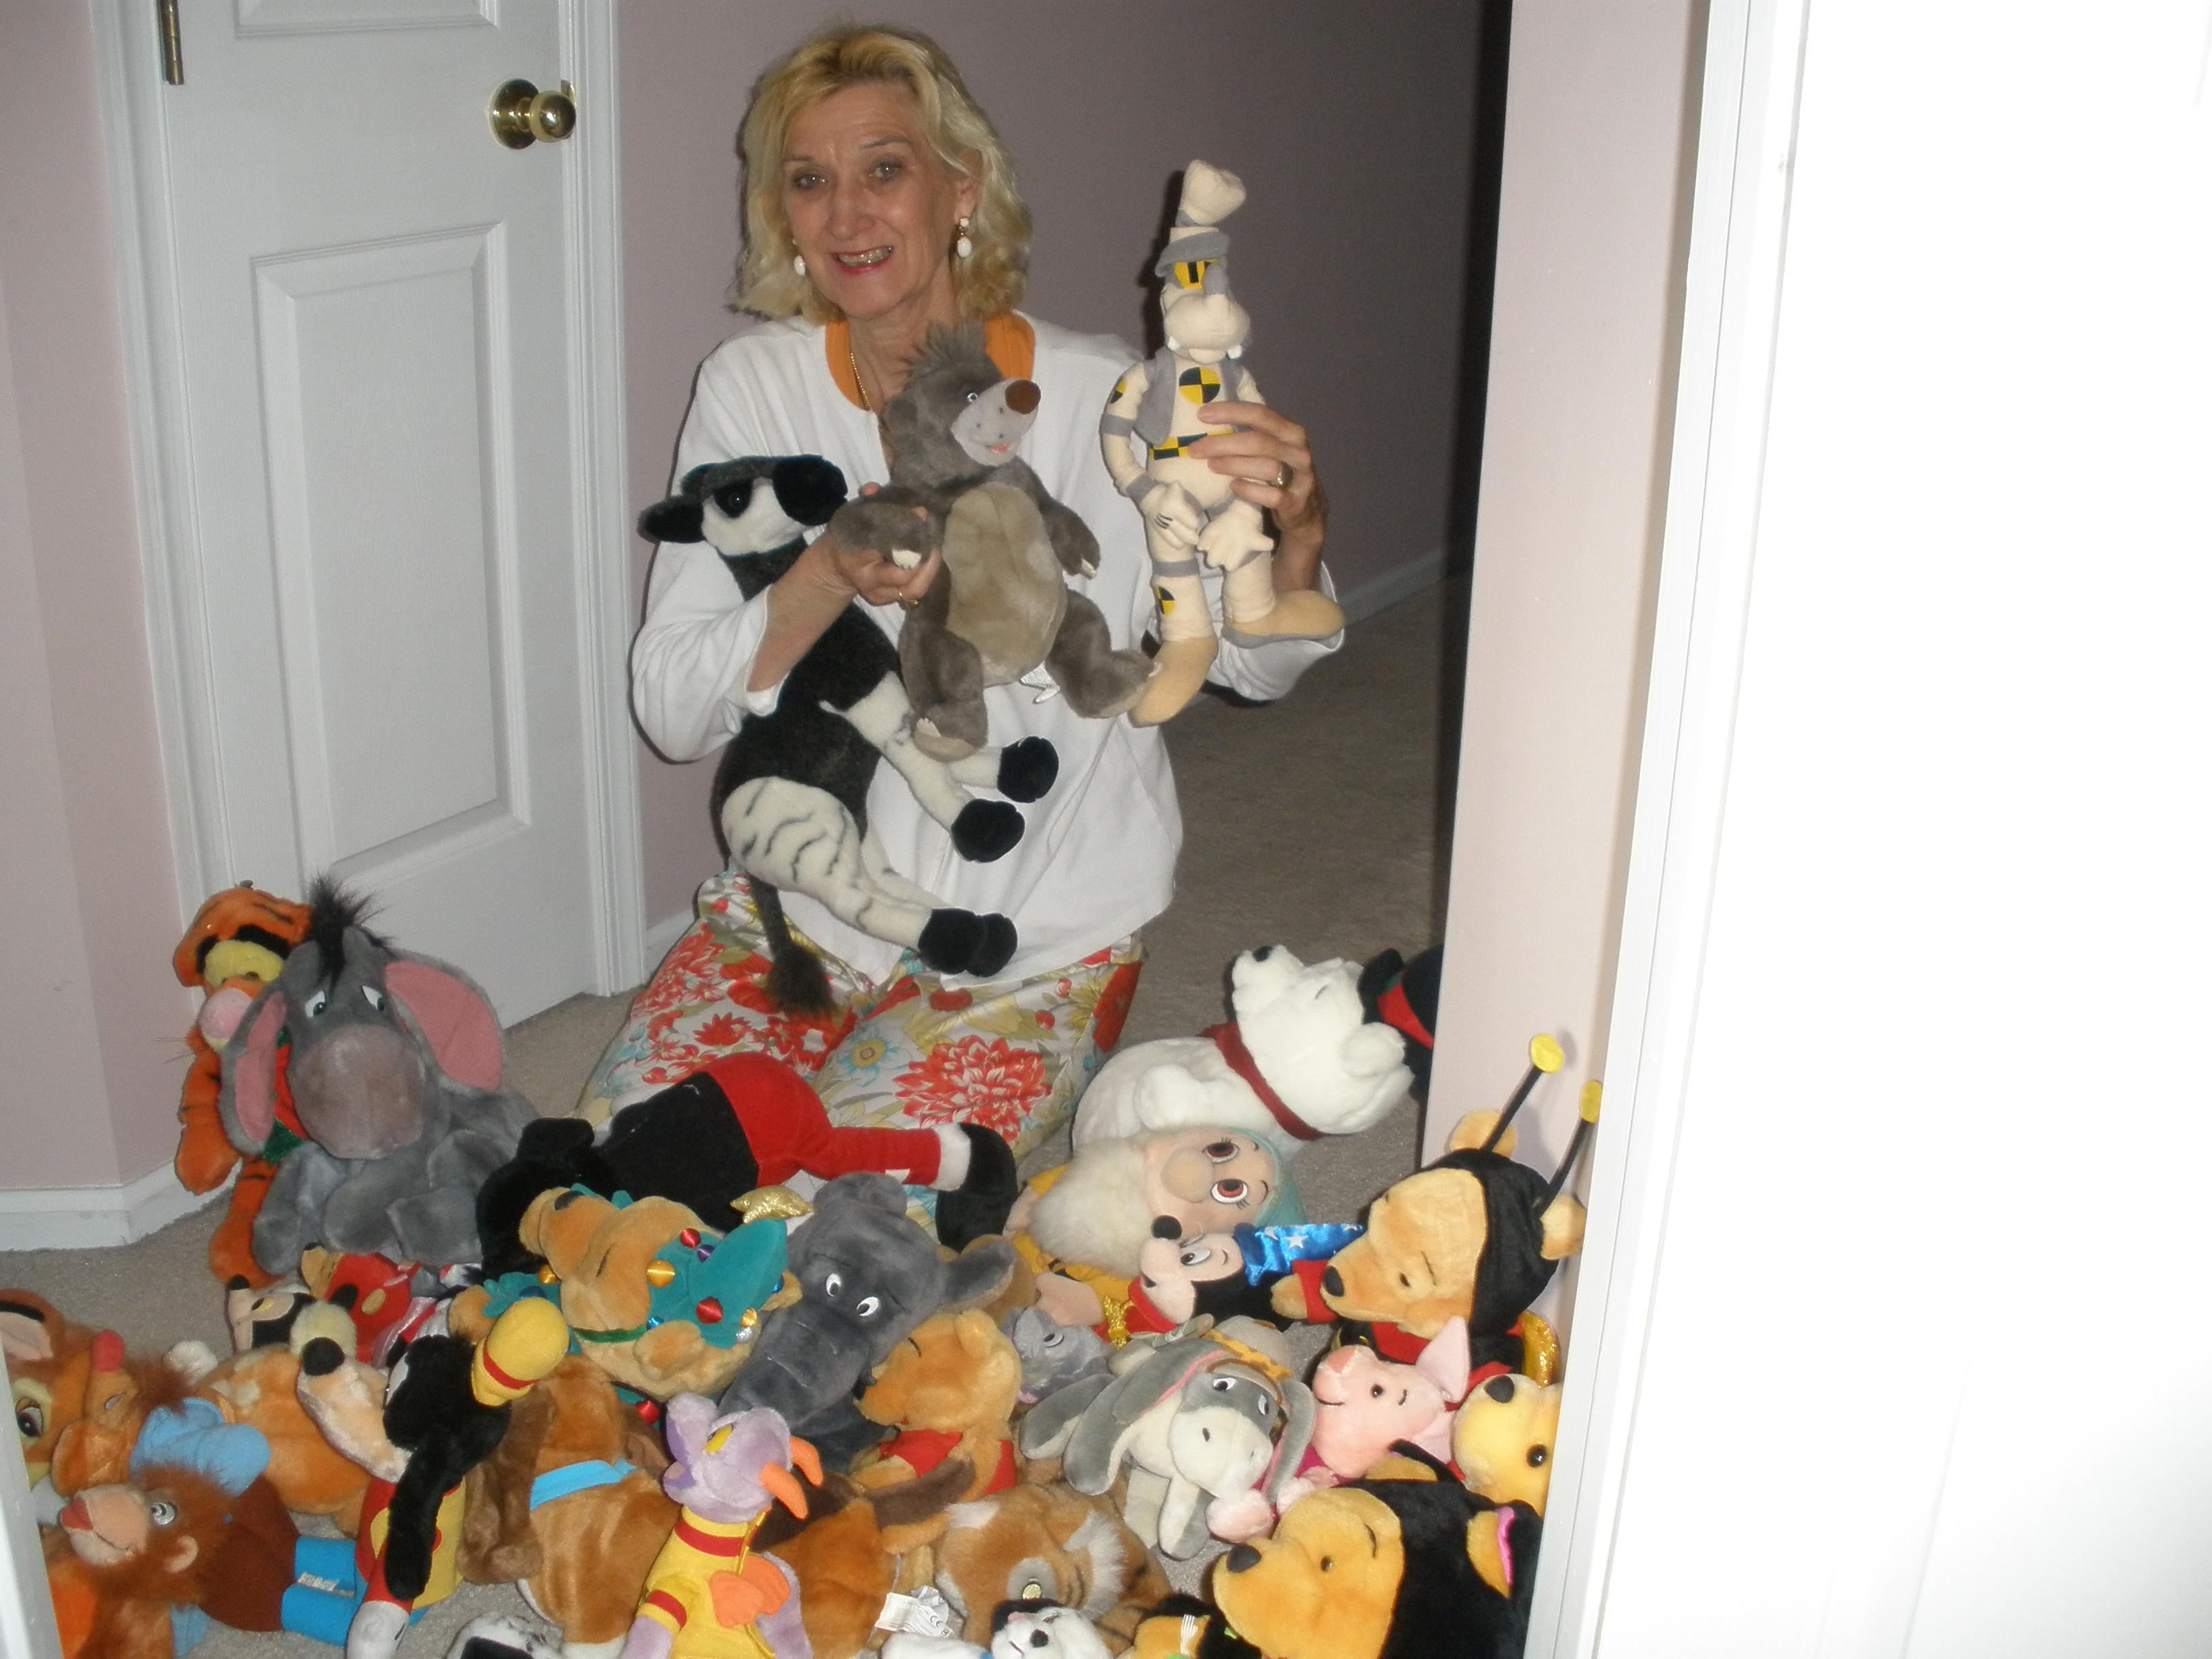 Donate New Stuffed Animals